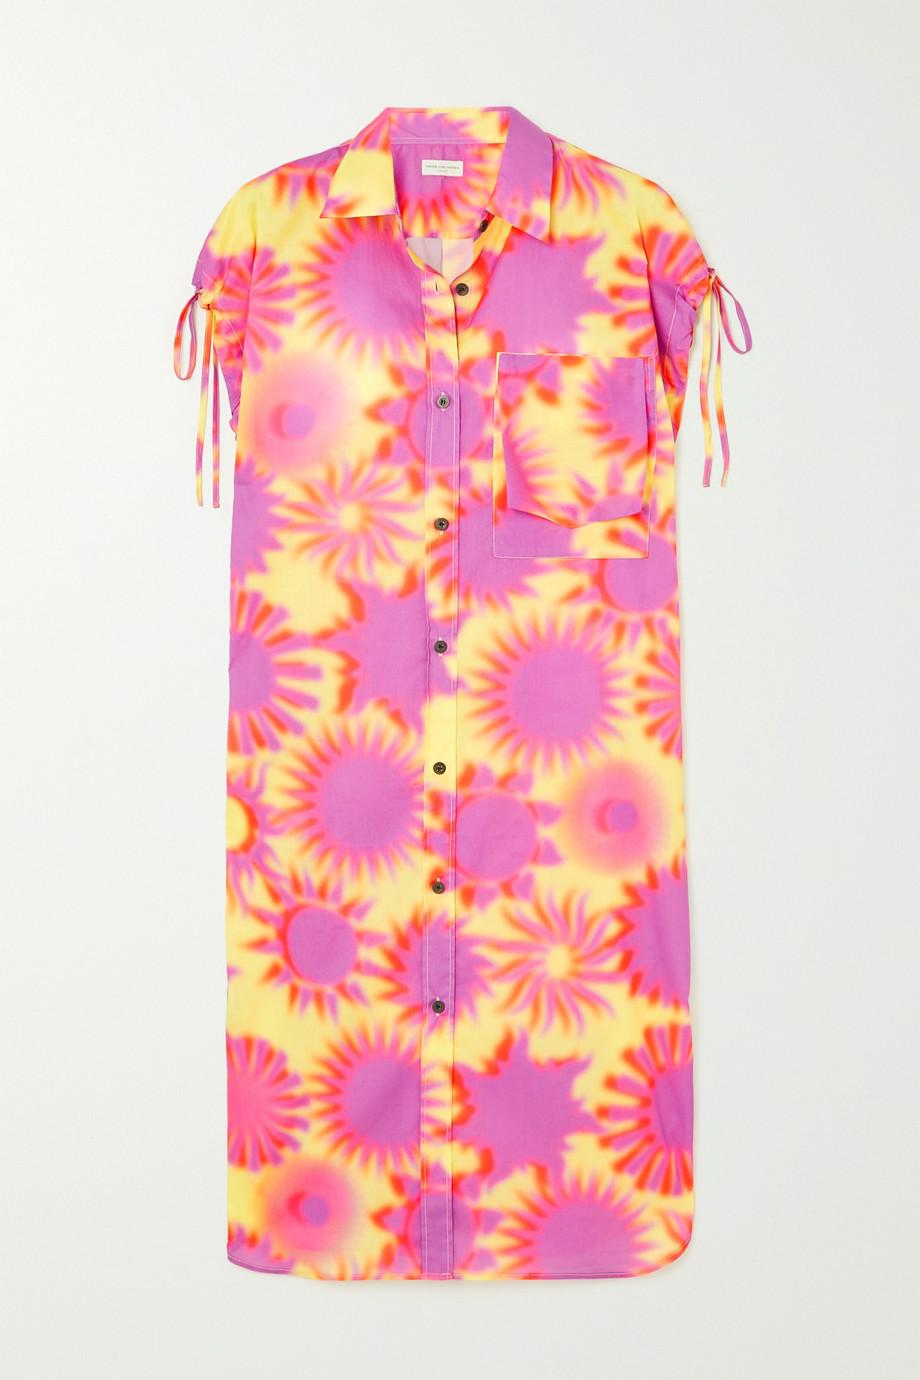 Dries Van Noten Dantia Mini-Hemdblusenkleid aus bedruckter Baumwollpopeline mit Raffungen